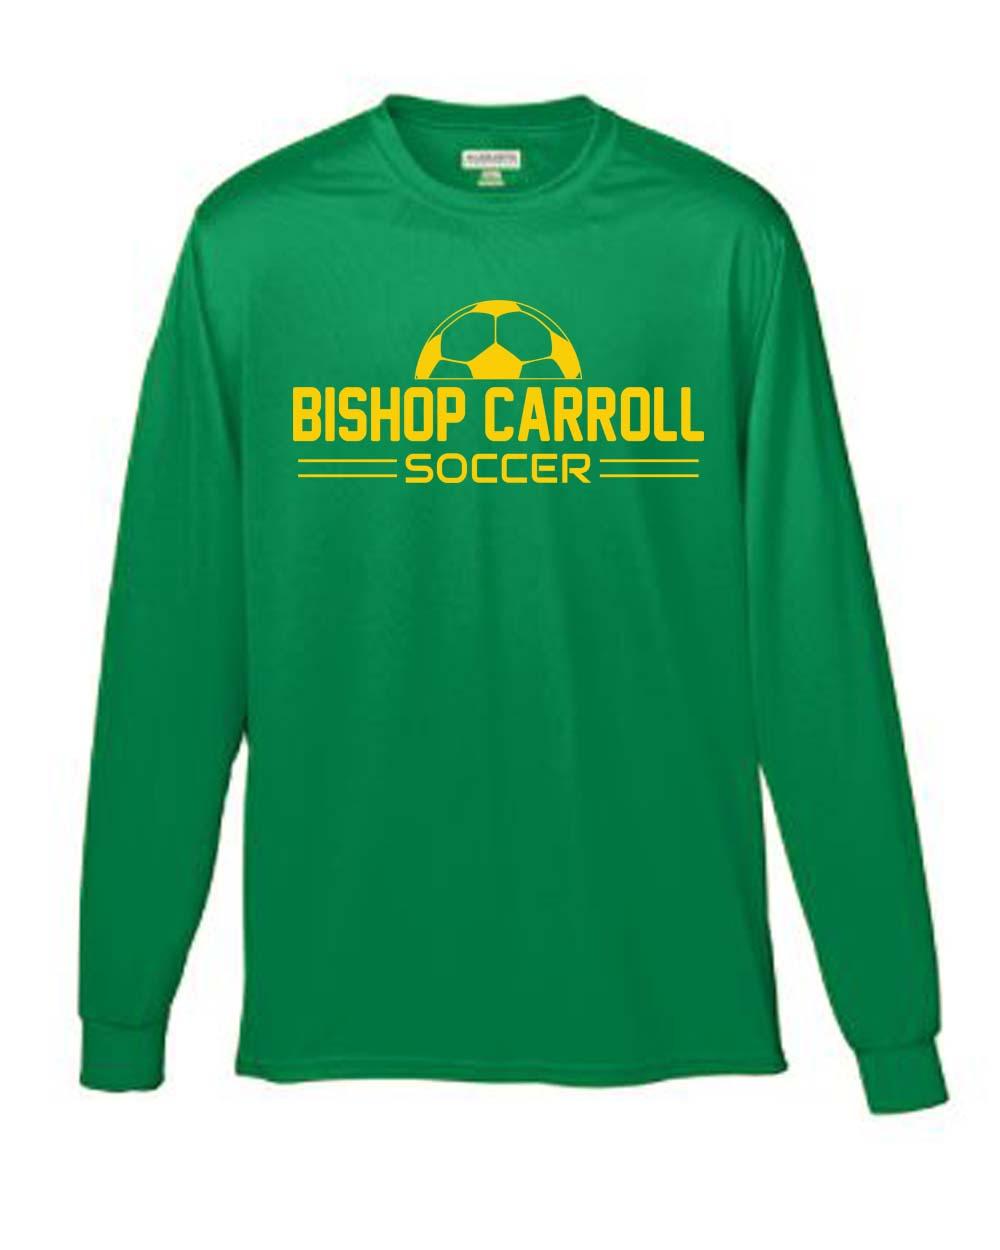 89f63b0c Bishop Carroll Soccer Ball Long Sleeve Moisture Wicking Tee - Atomic